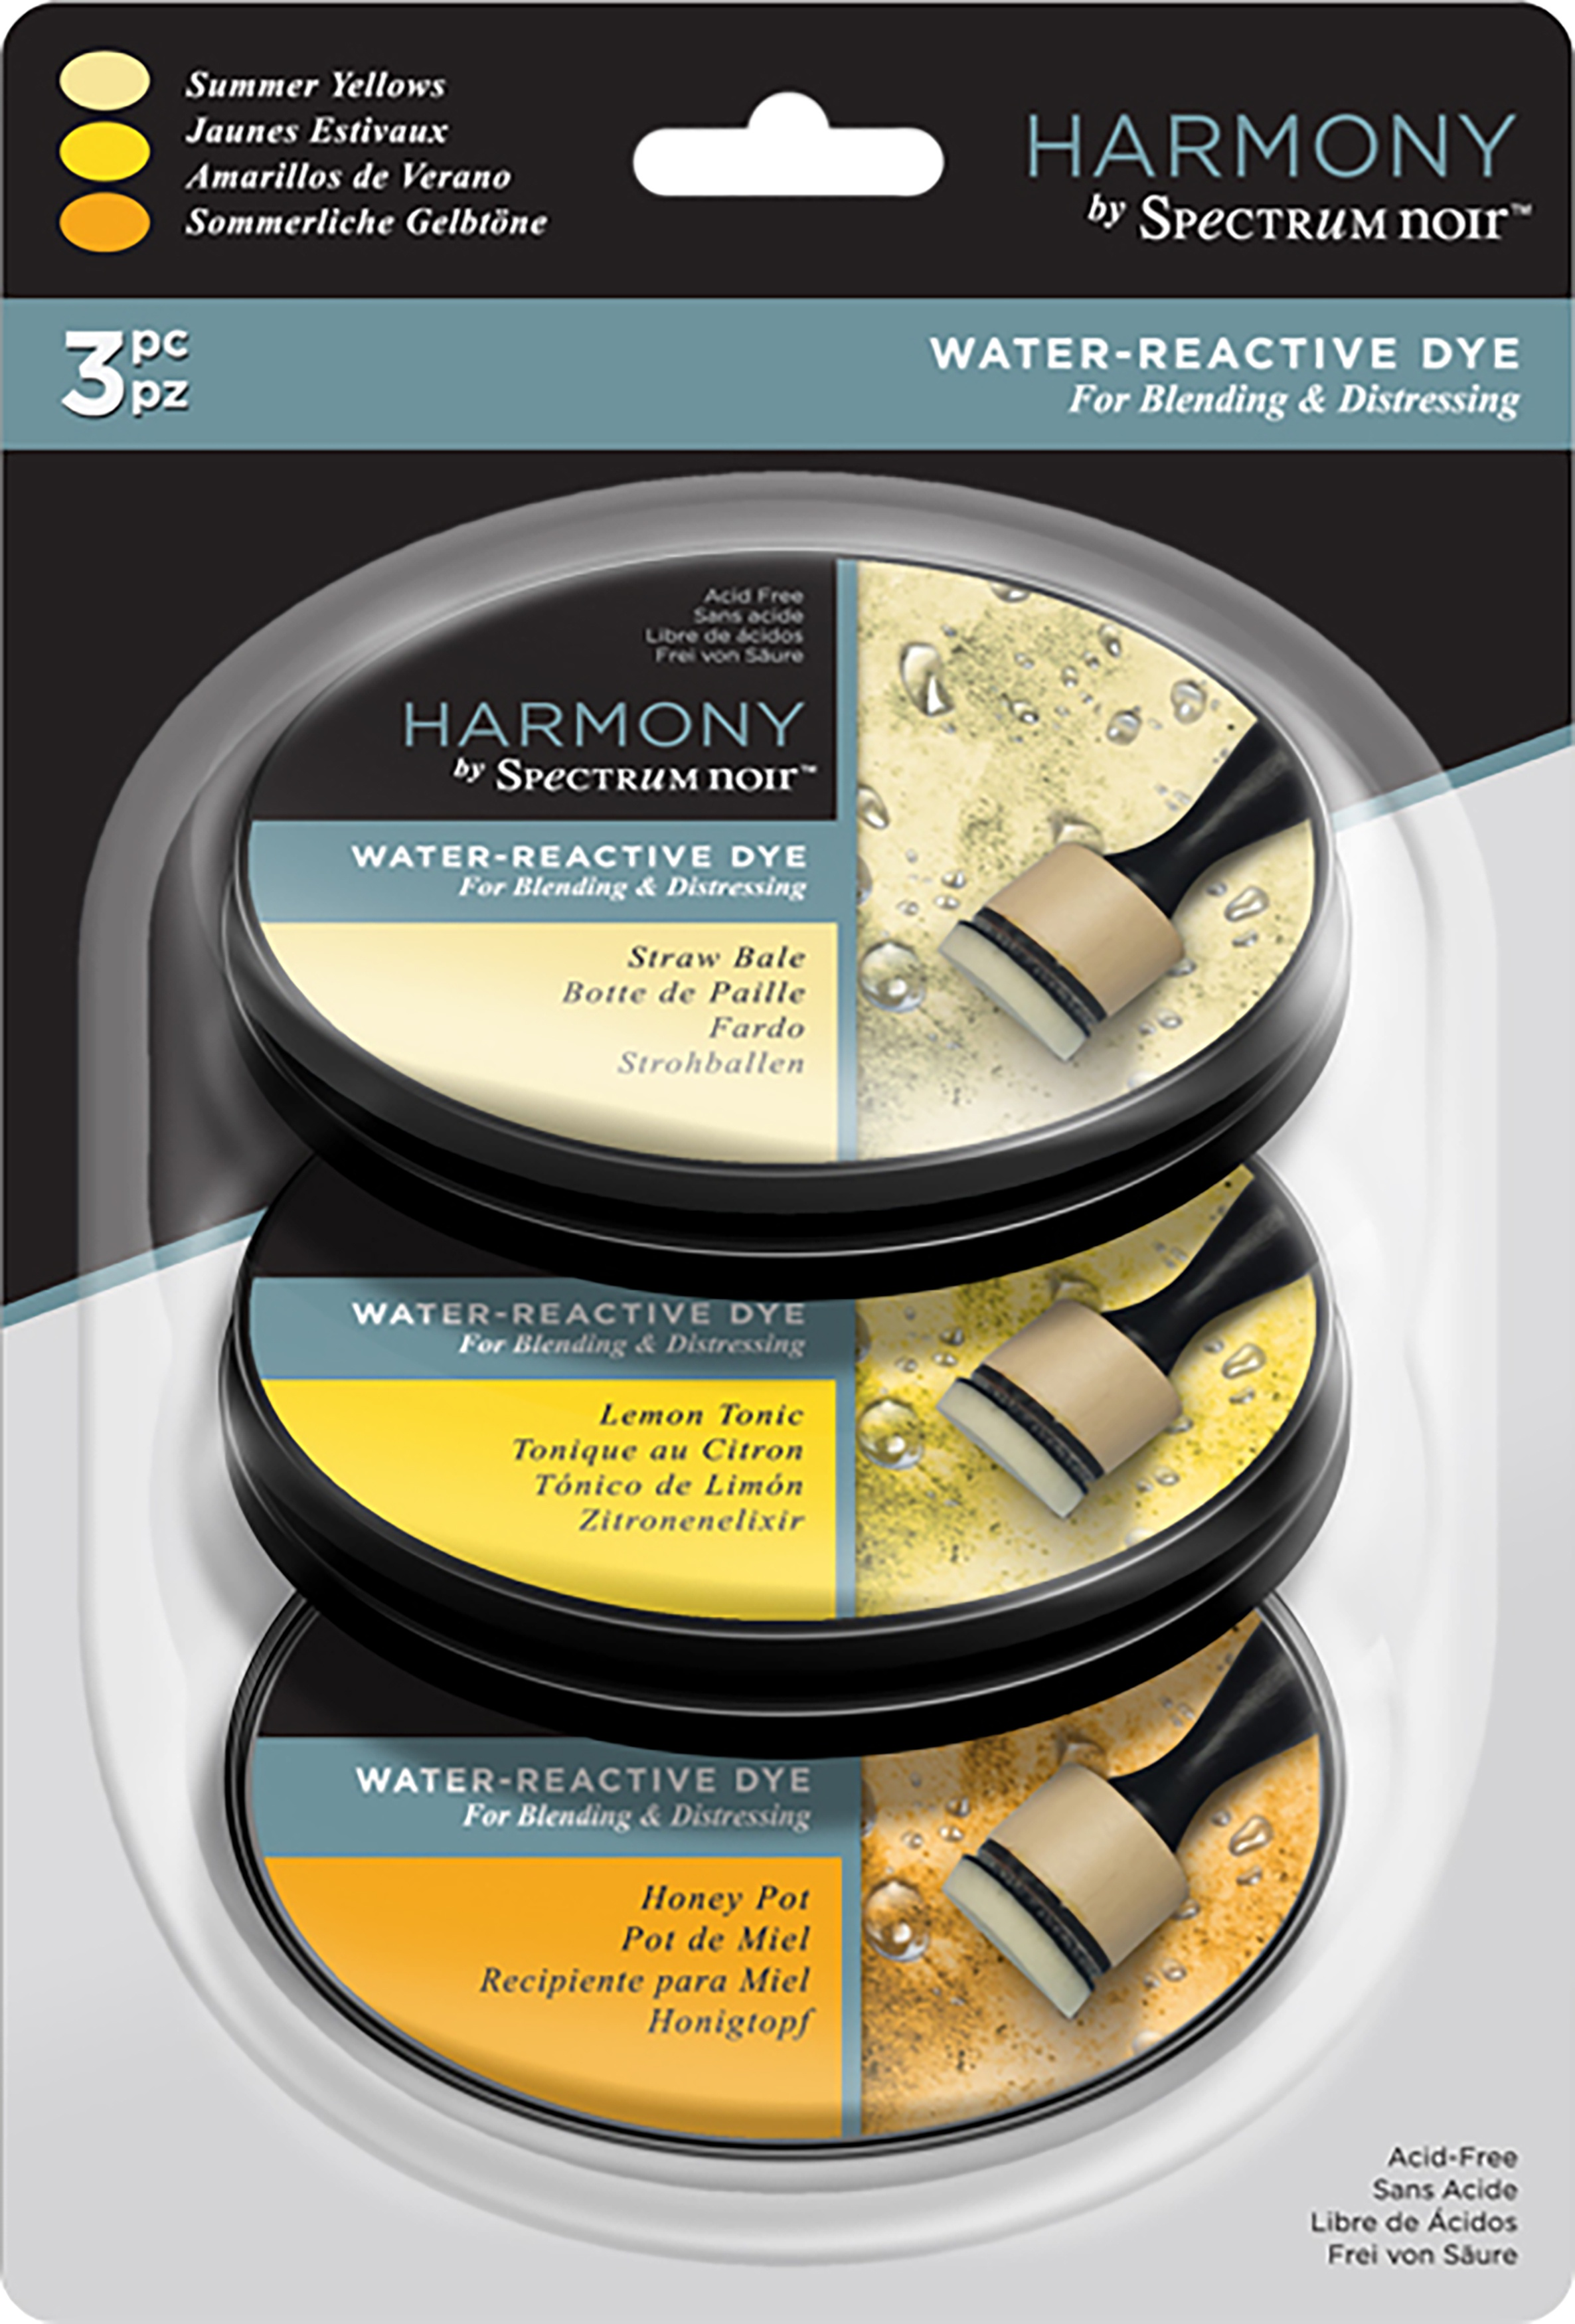 Spec Ink Water-Reactive Dye Summer Yellows